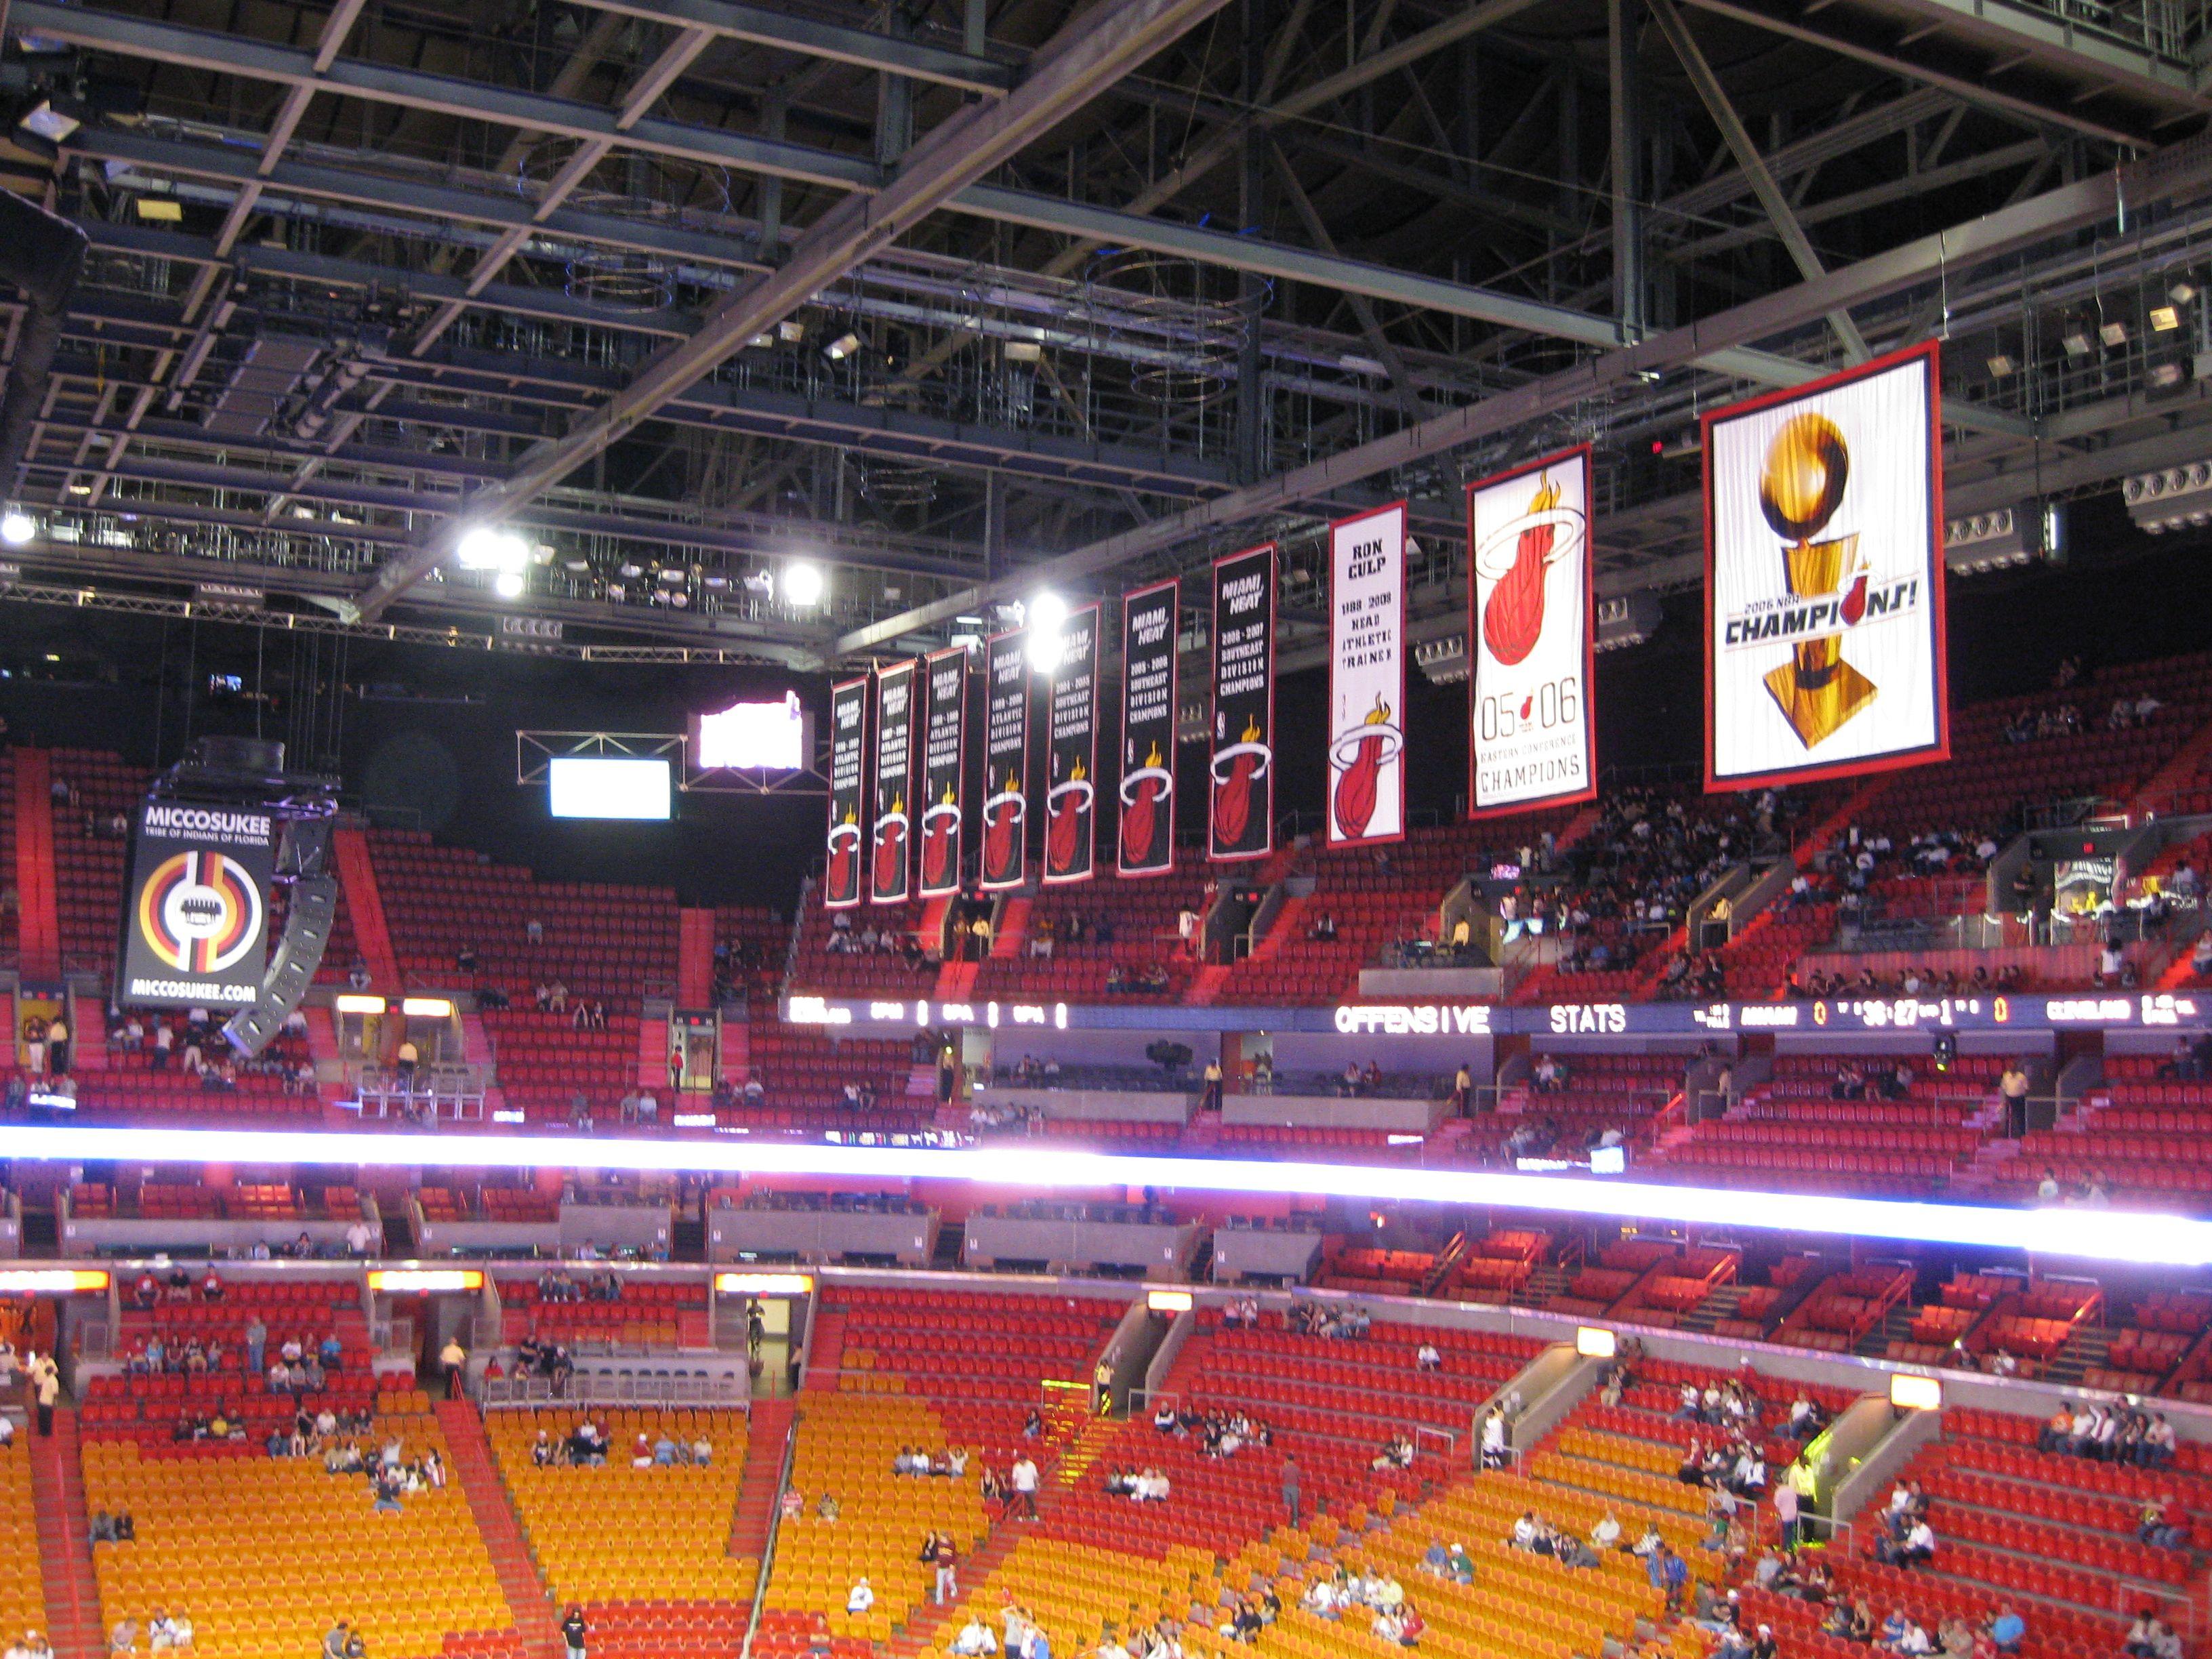 Miami Heat Colors Miami heat basketball, Miami heat